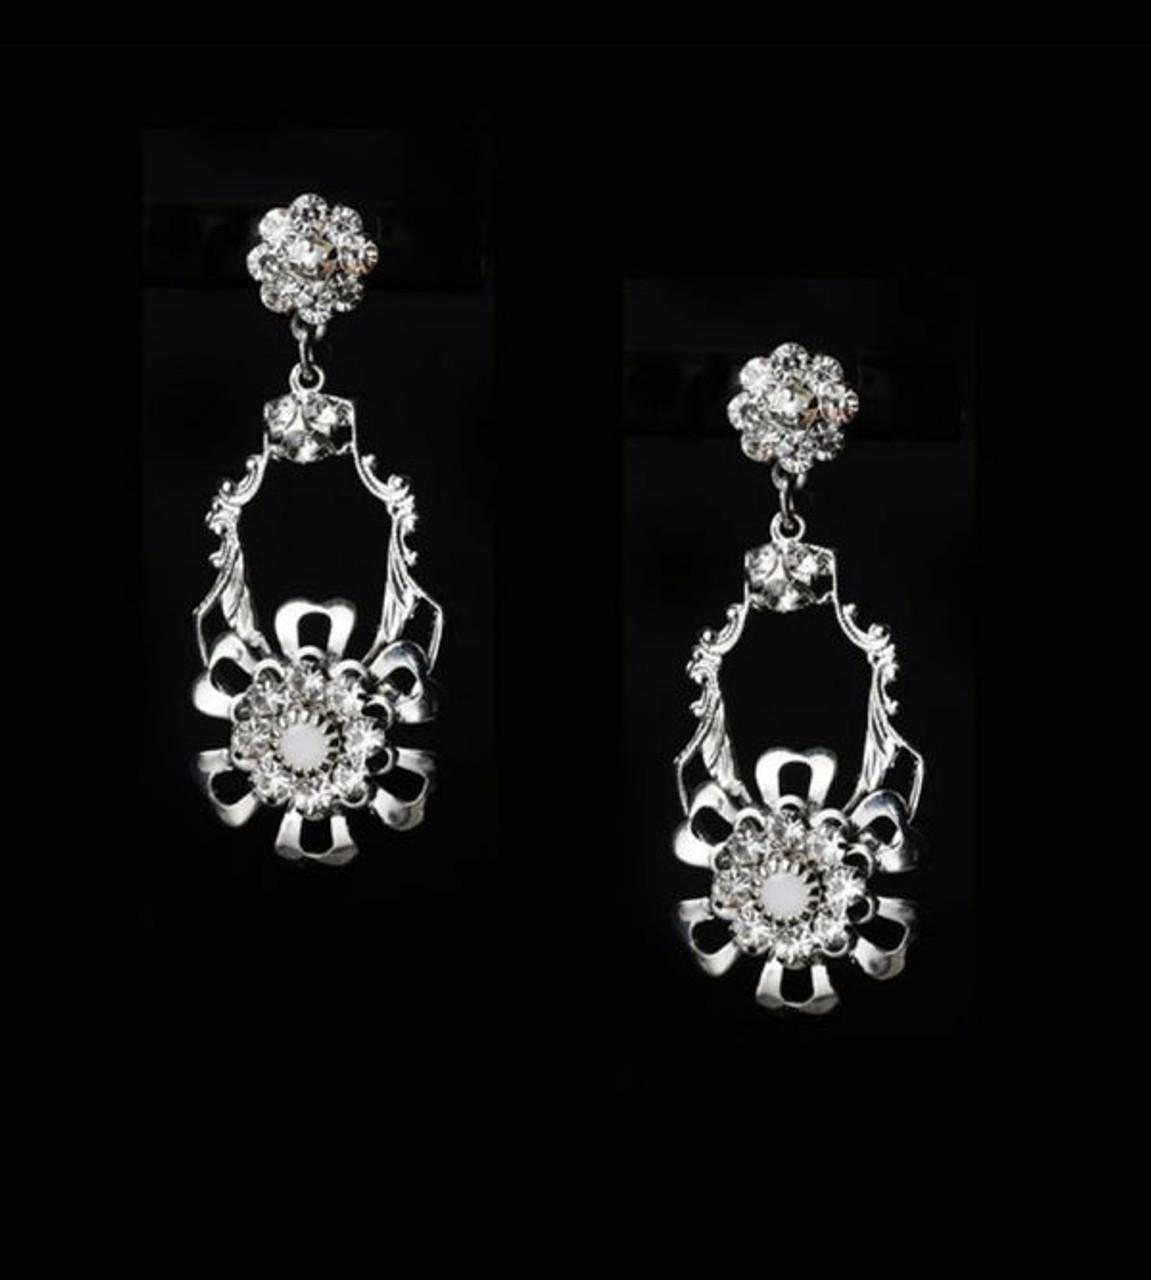 Erica Koesler Earring - Style J-9480